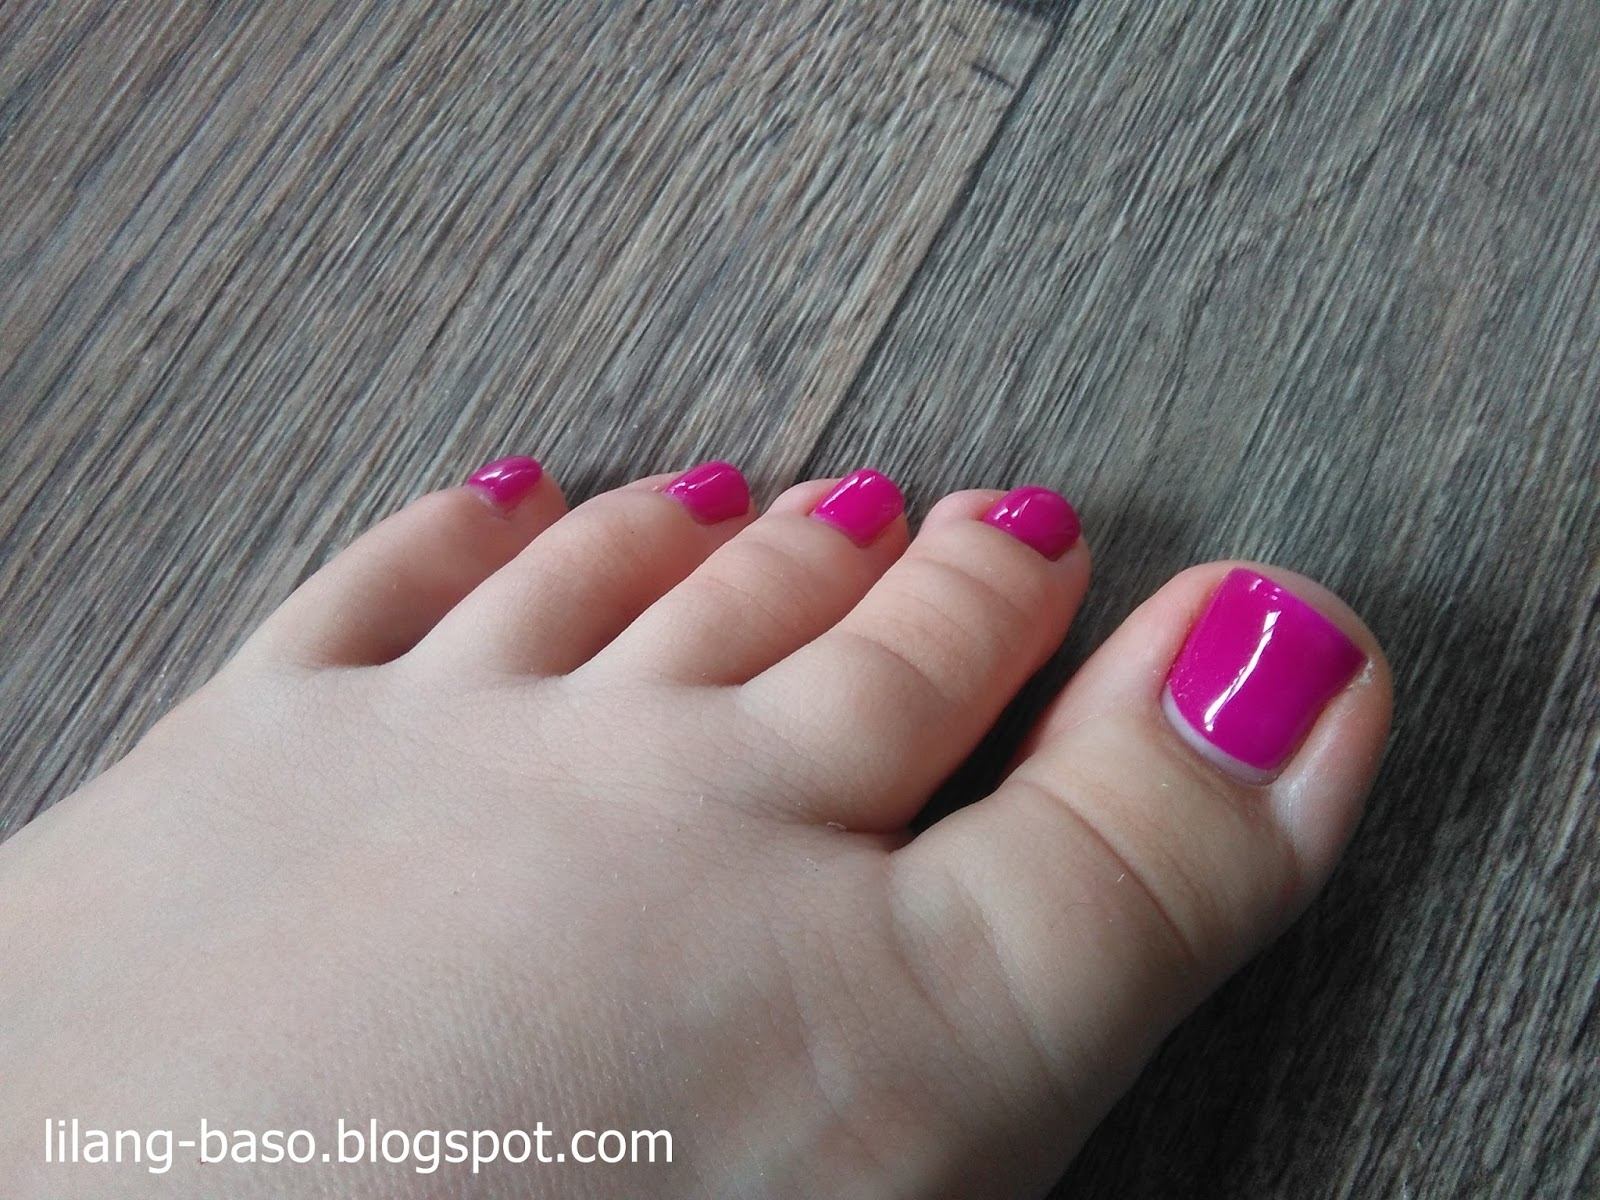 Inspiracje na paznokcie u nóg